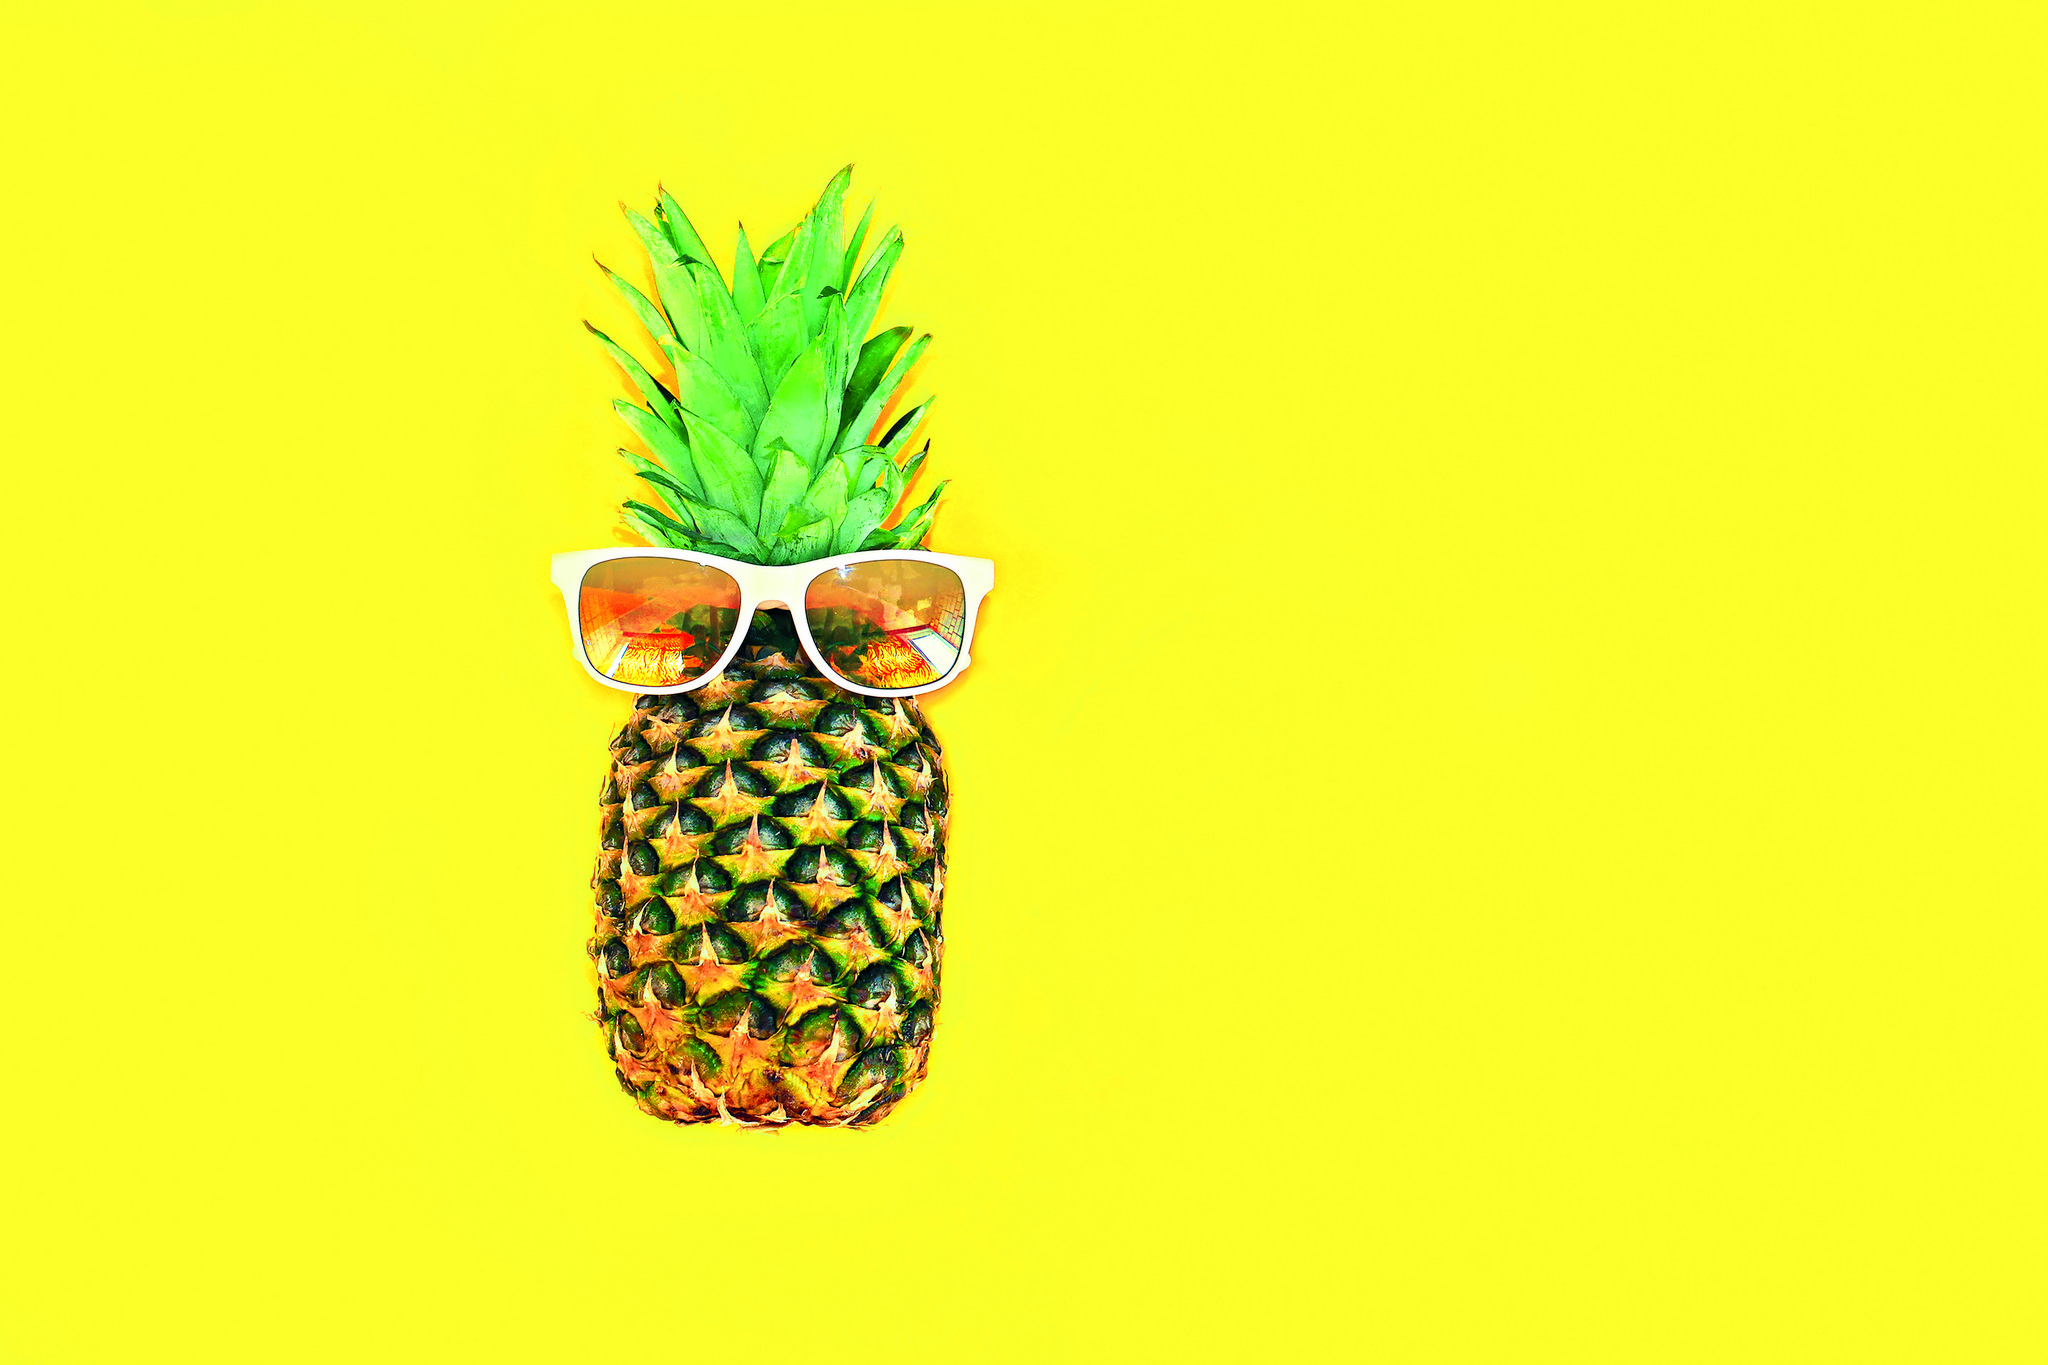 pineapple_2_0001.jpg